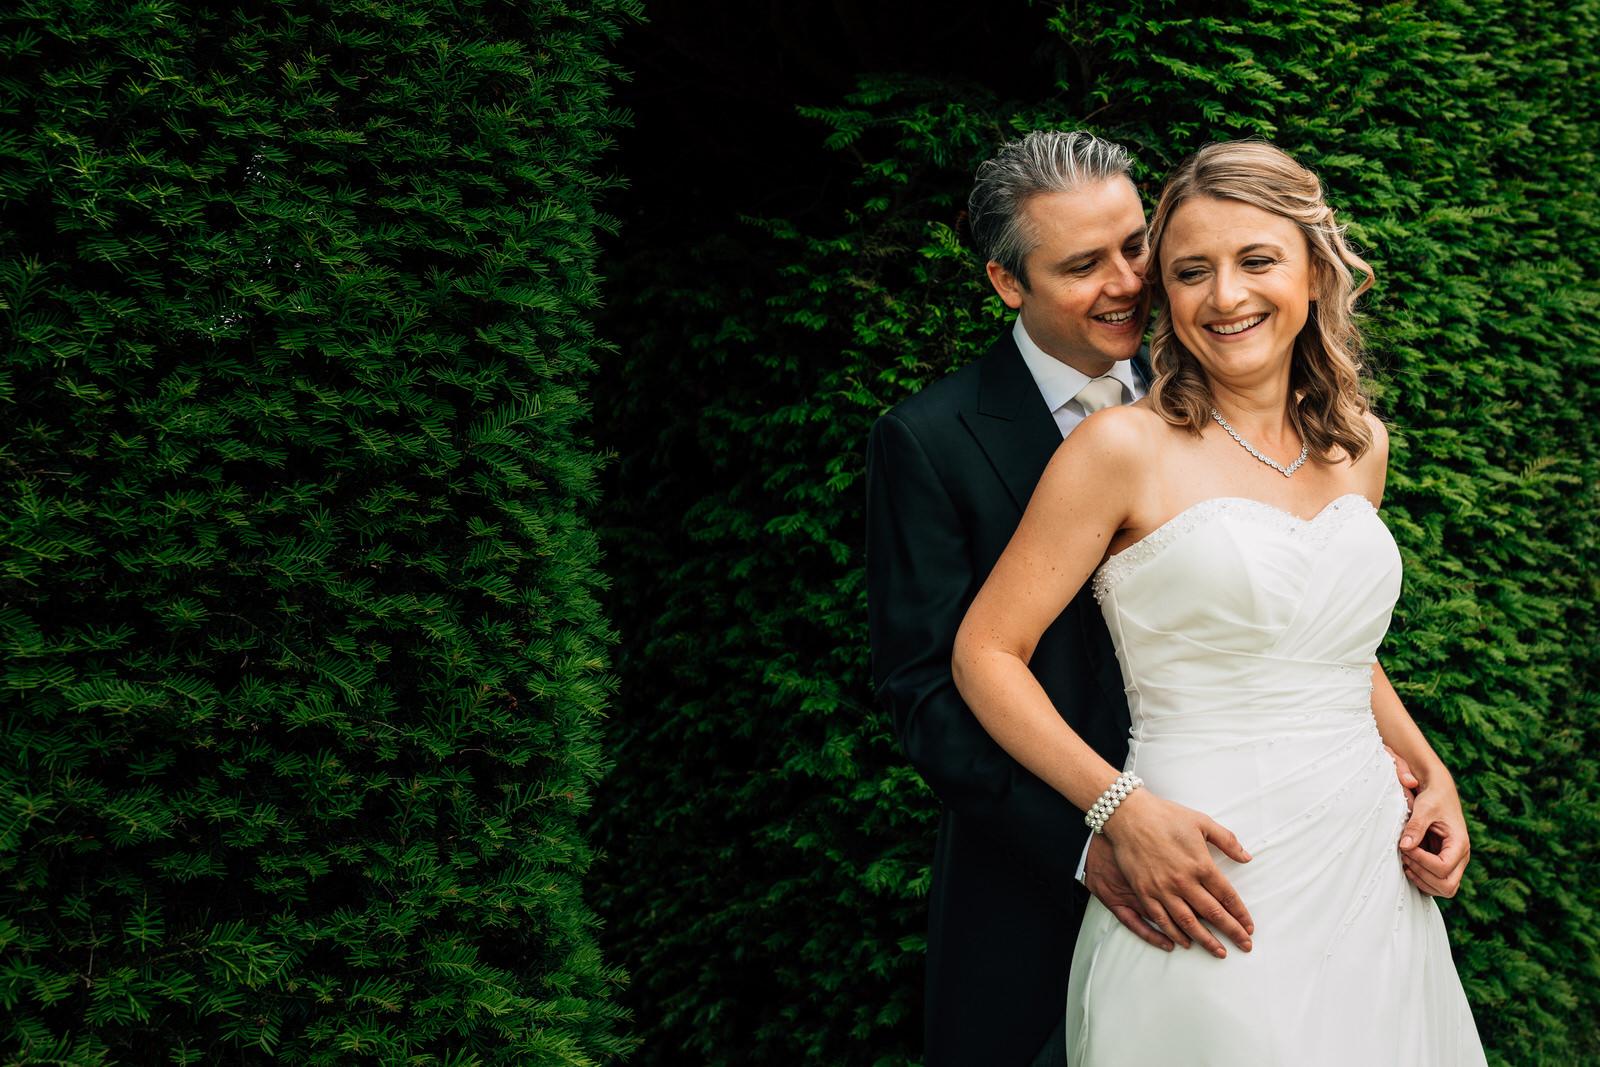 Home counties wedding photography by Damion Mower on English-Wedding.com (31)